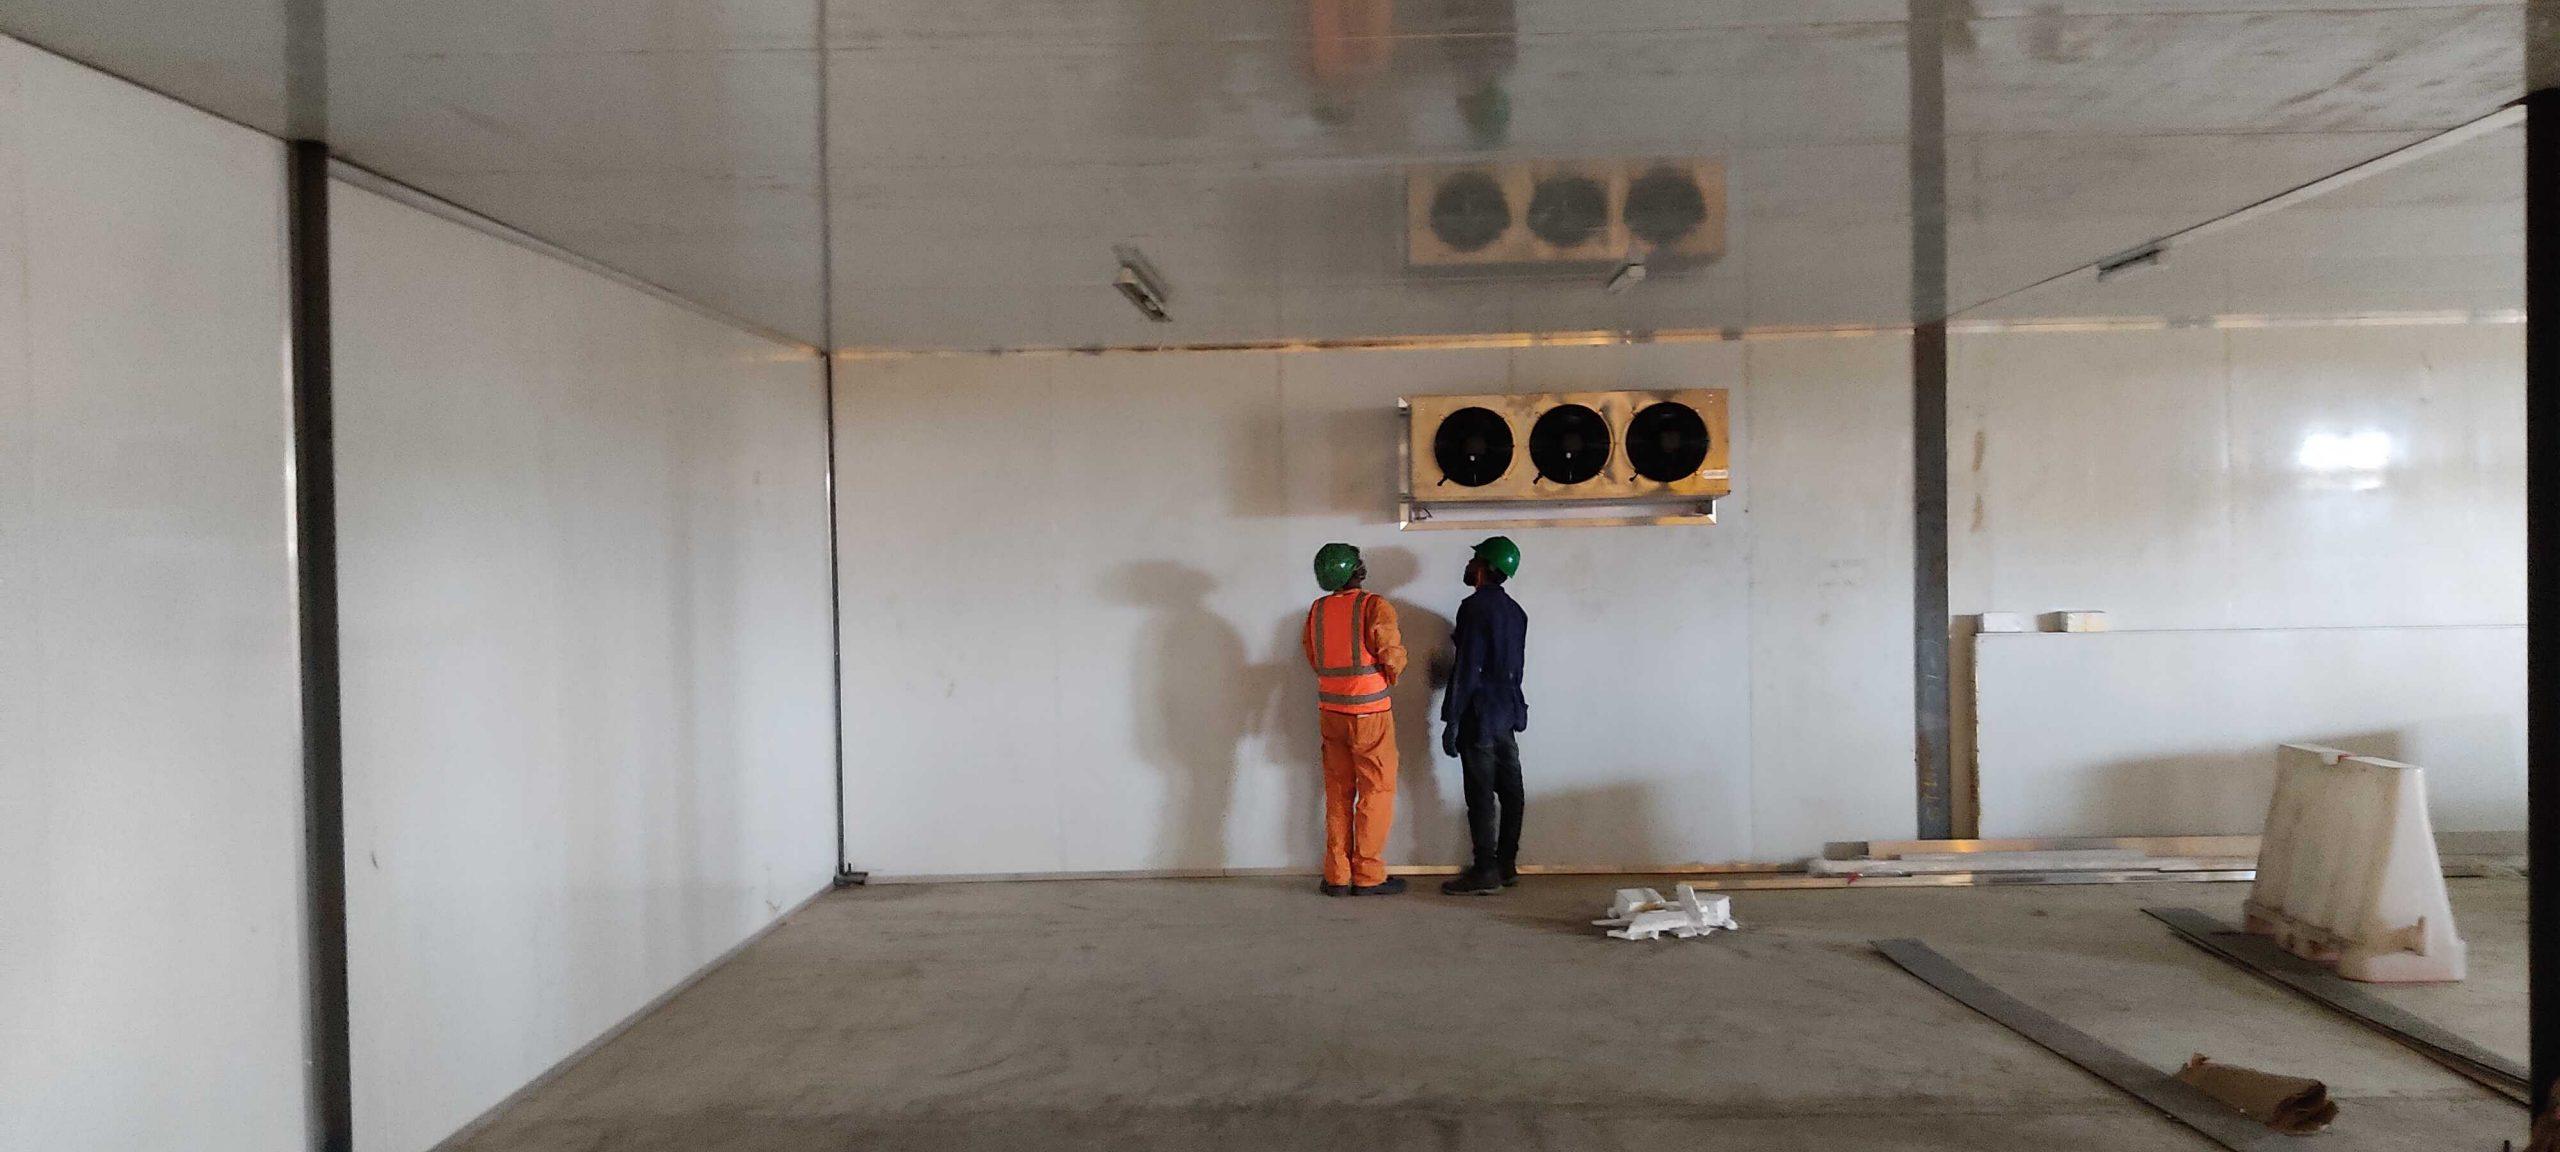 Cold room fabrication in Nigeria.. AKPO OYEGWA REFRIGERATION COMPANY.